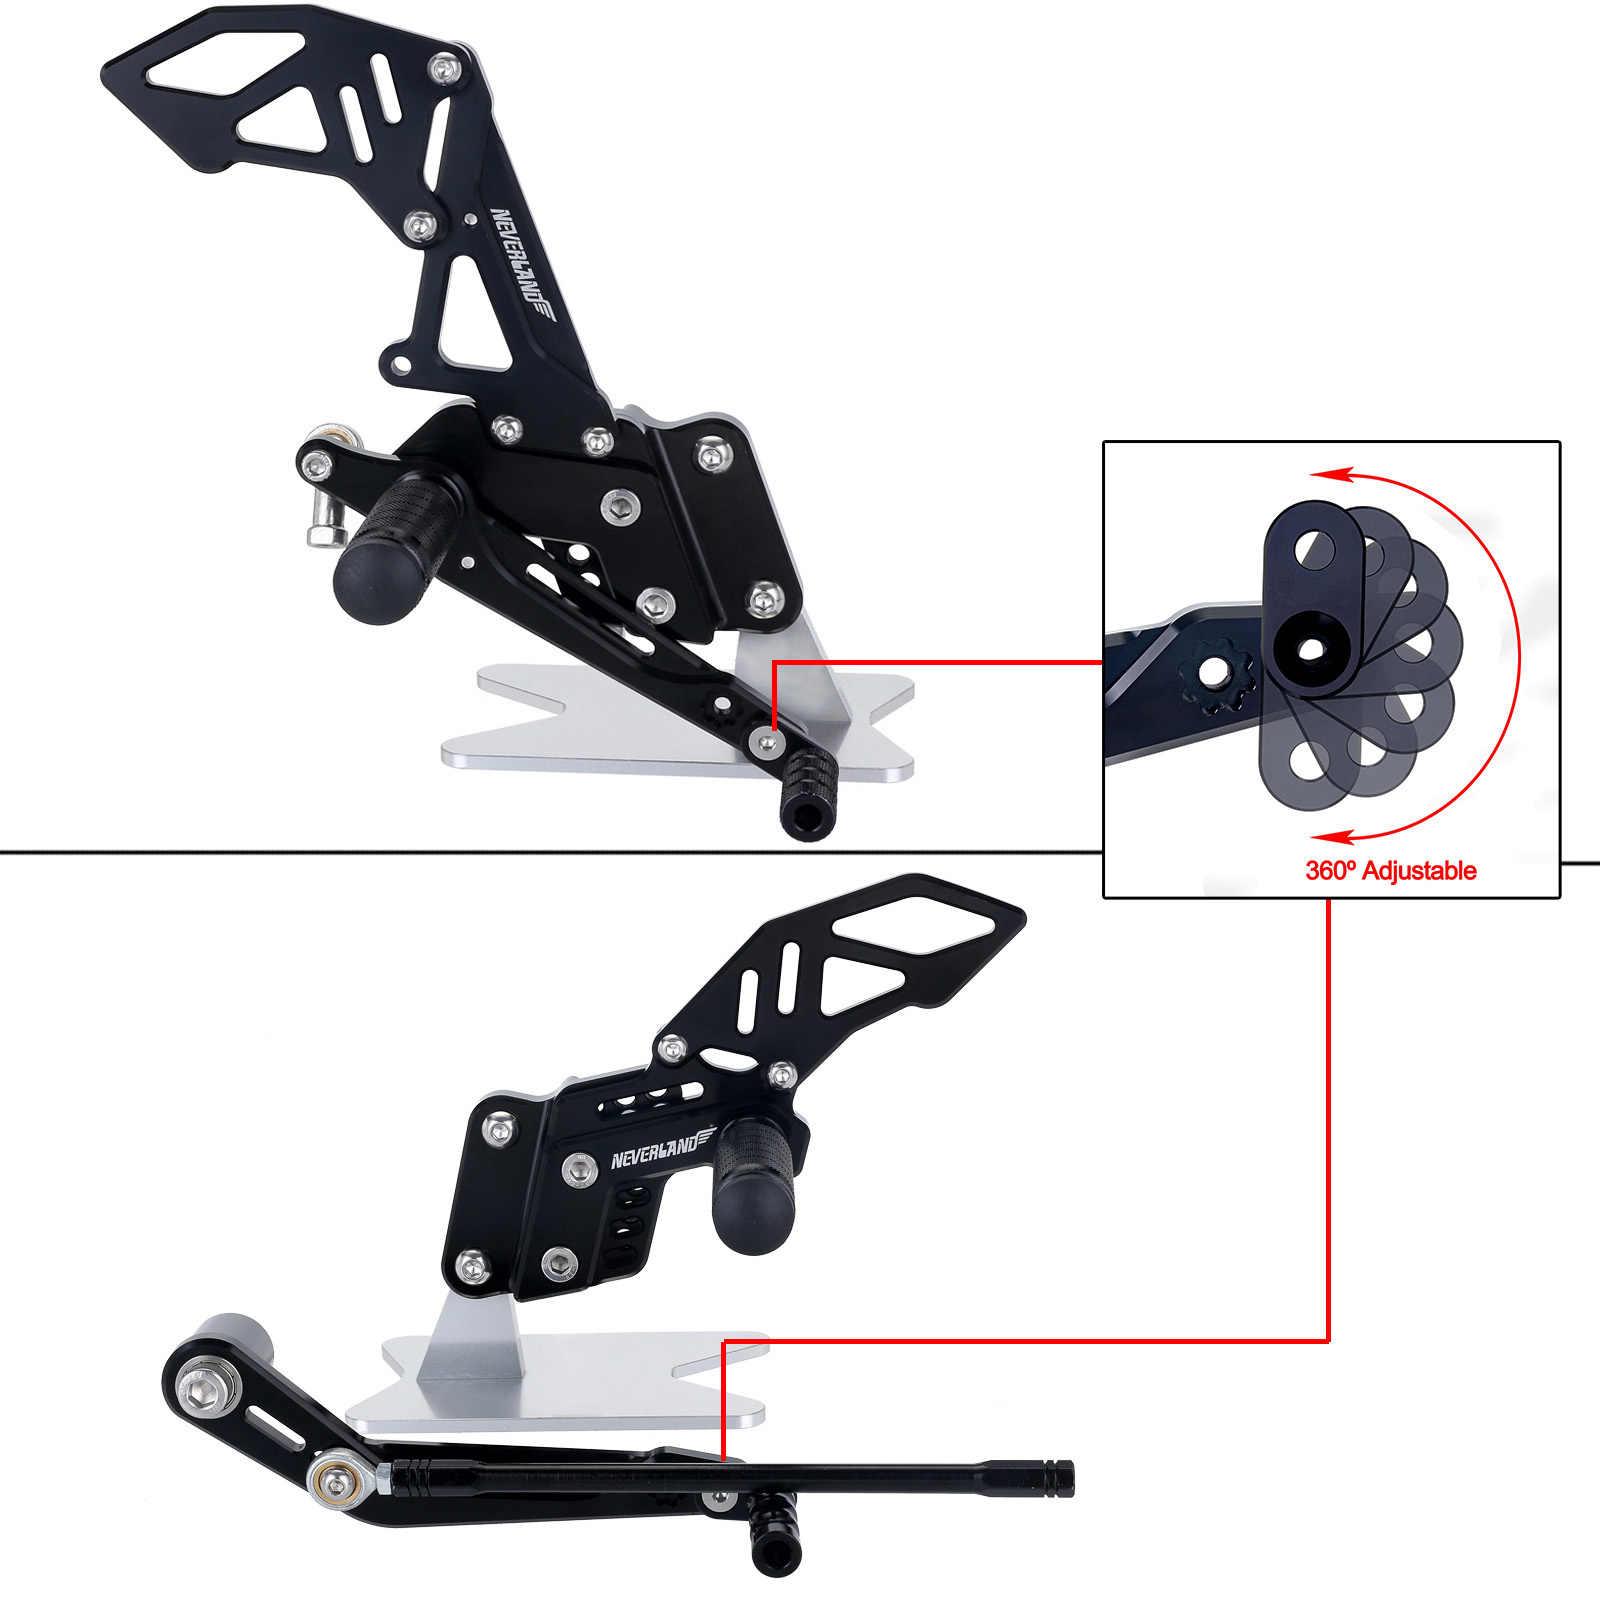 Design preto cnc motocicleta reat apoio para os pés pedal pegs conjunto para suzuki GSX-R 600 750 GSX-R gsxr d40